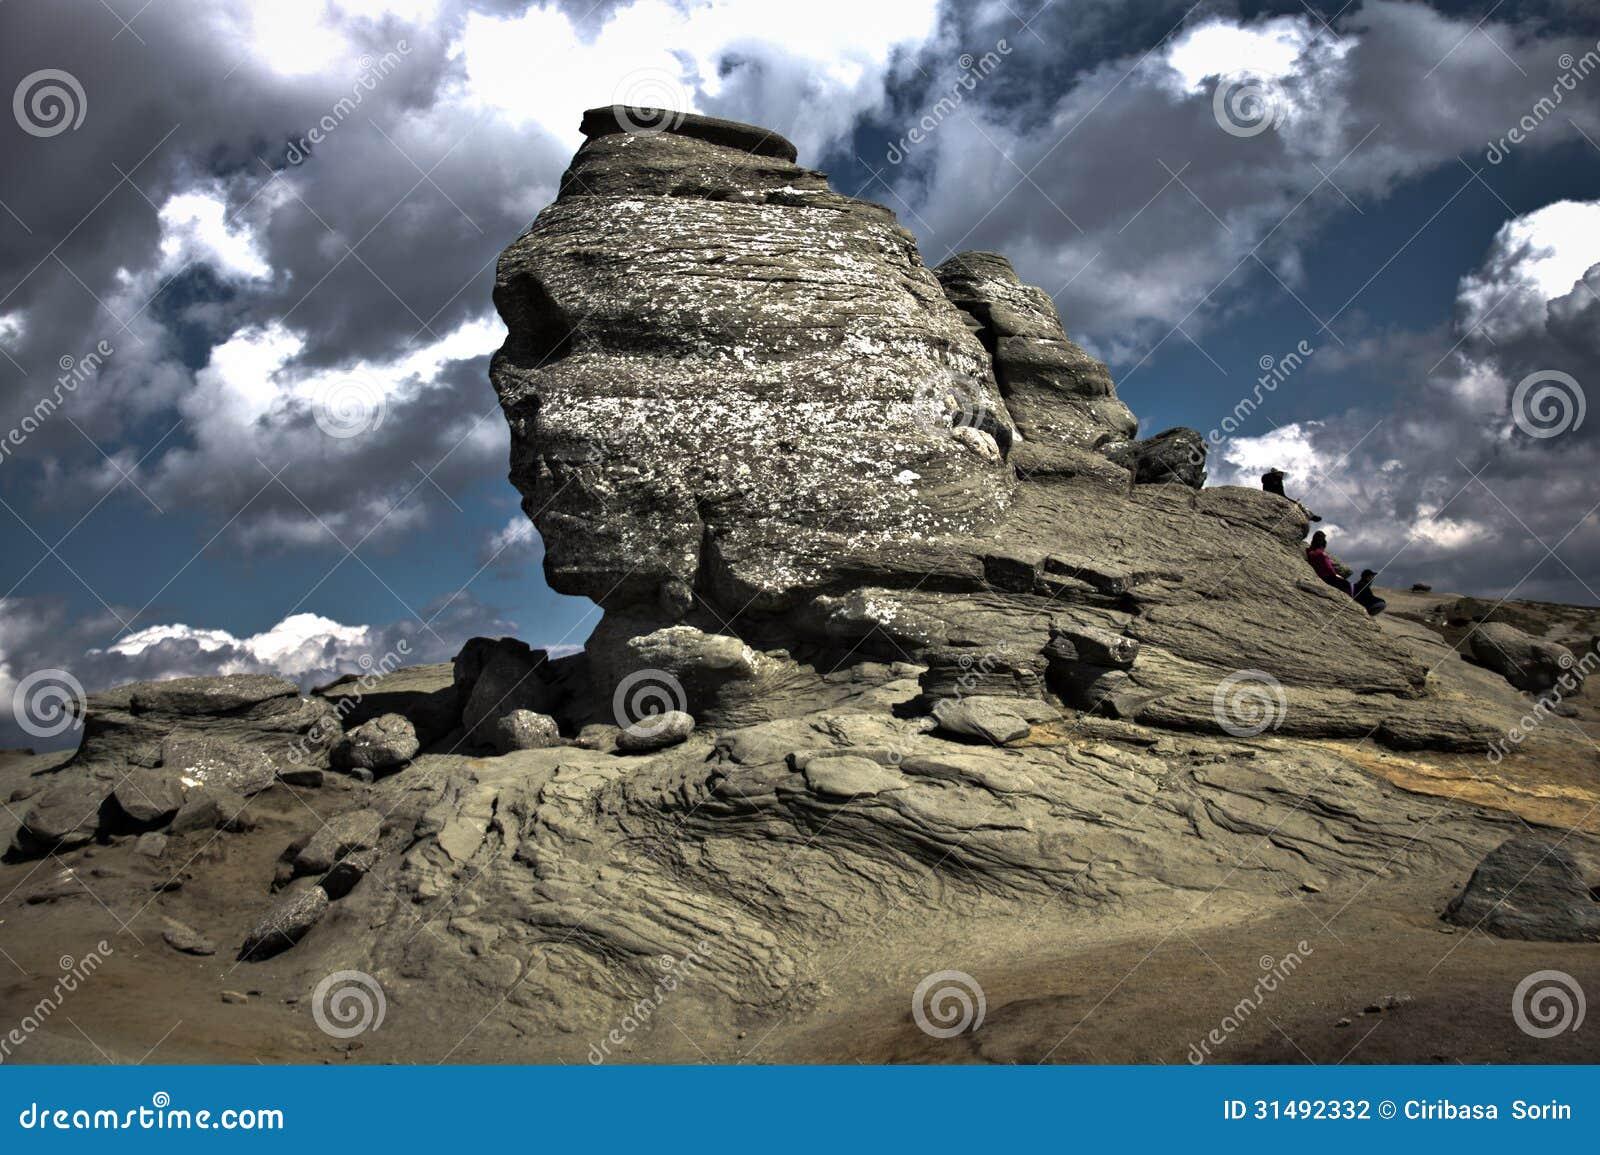 Natural Rock Faces : Face rock stock photography image